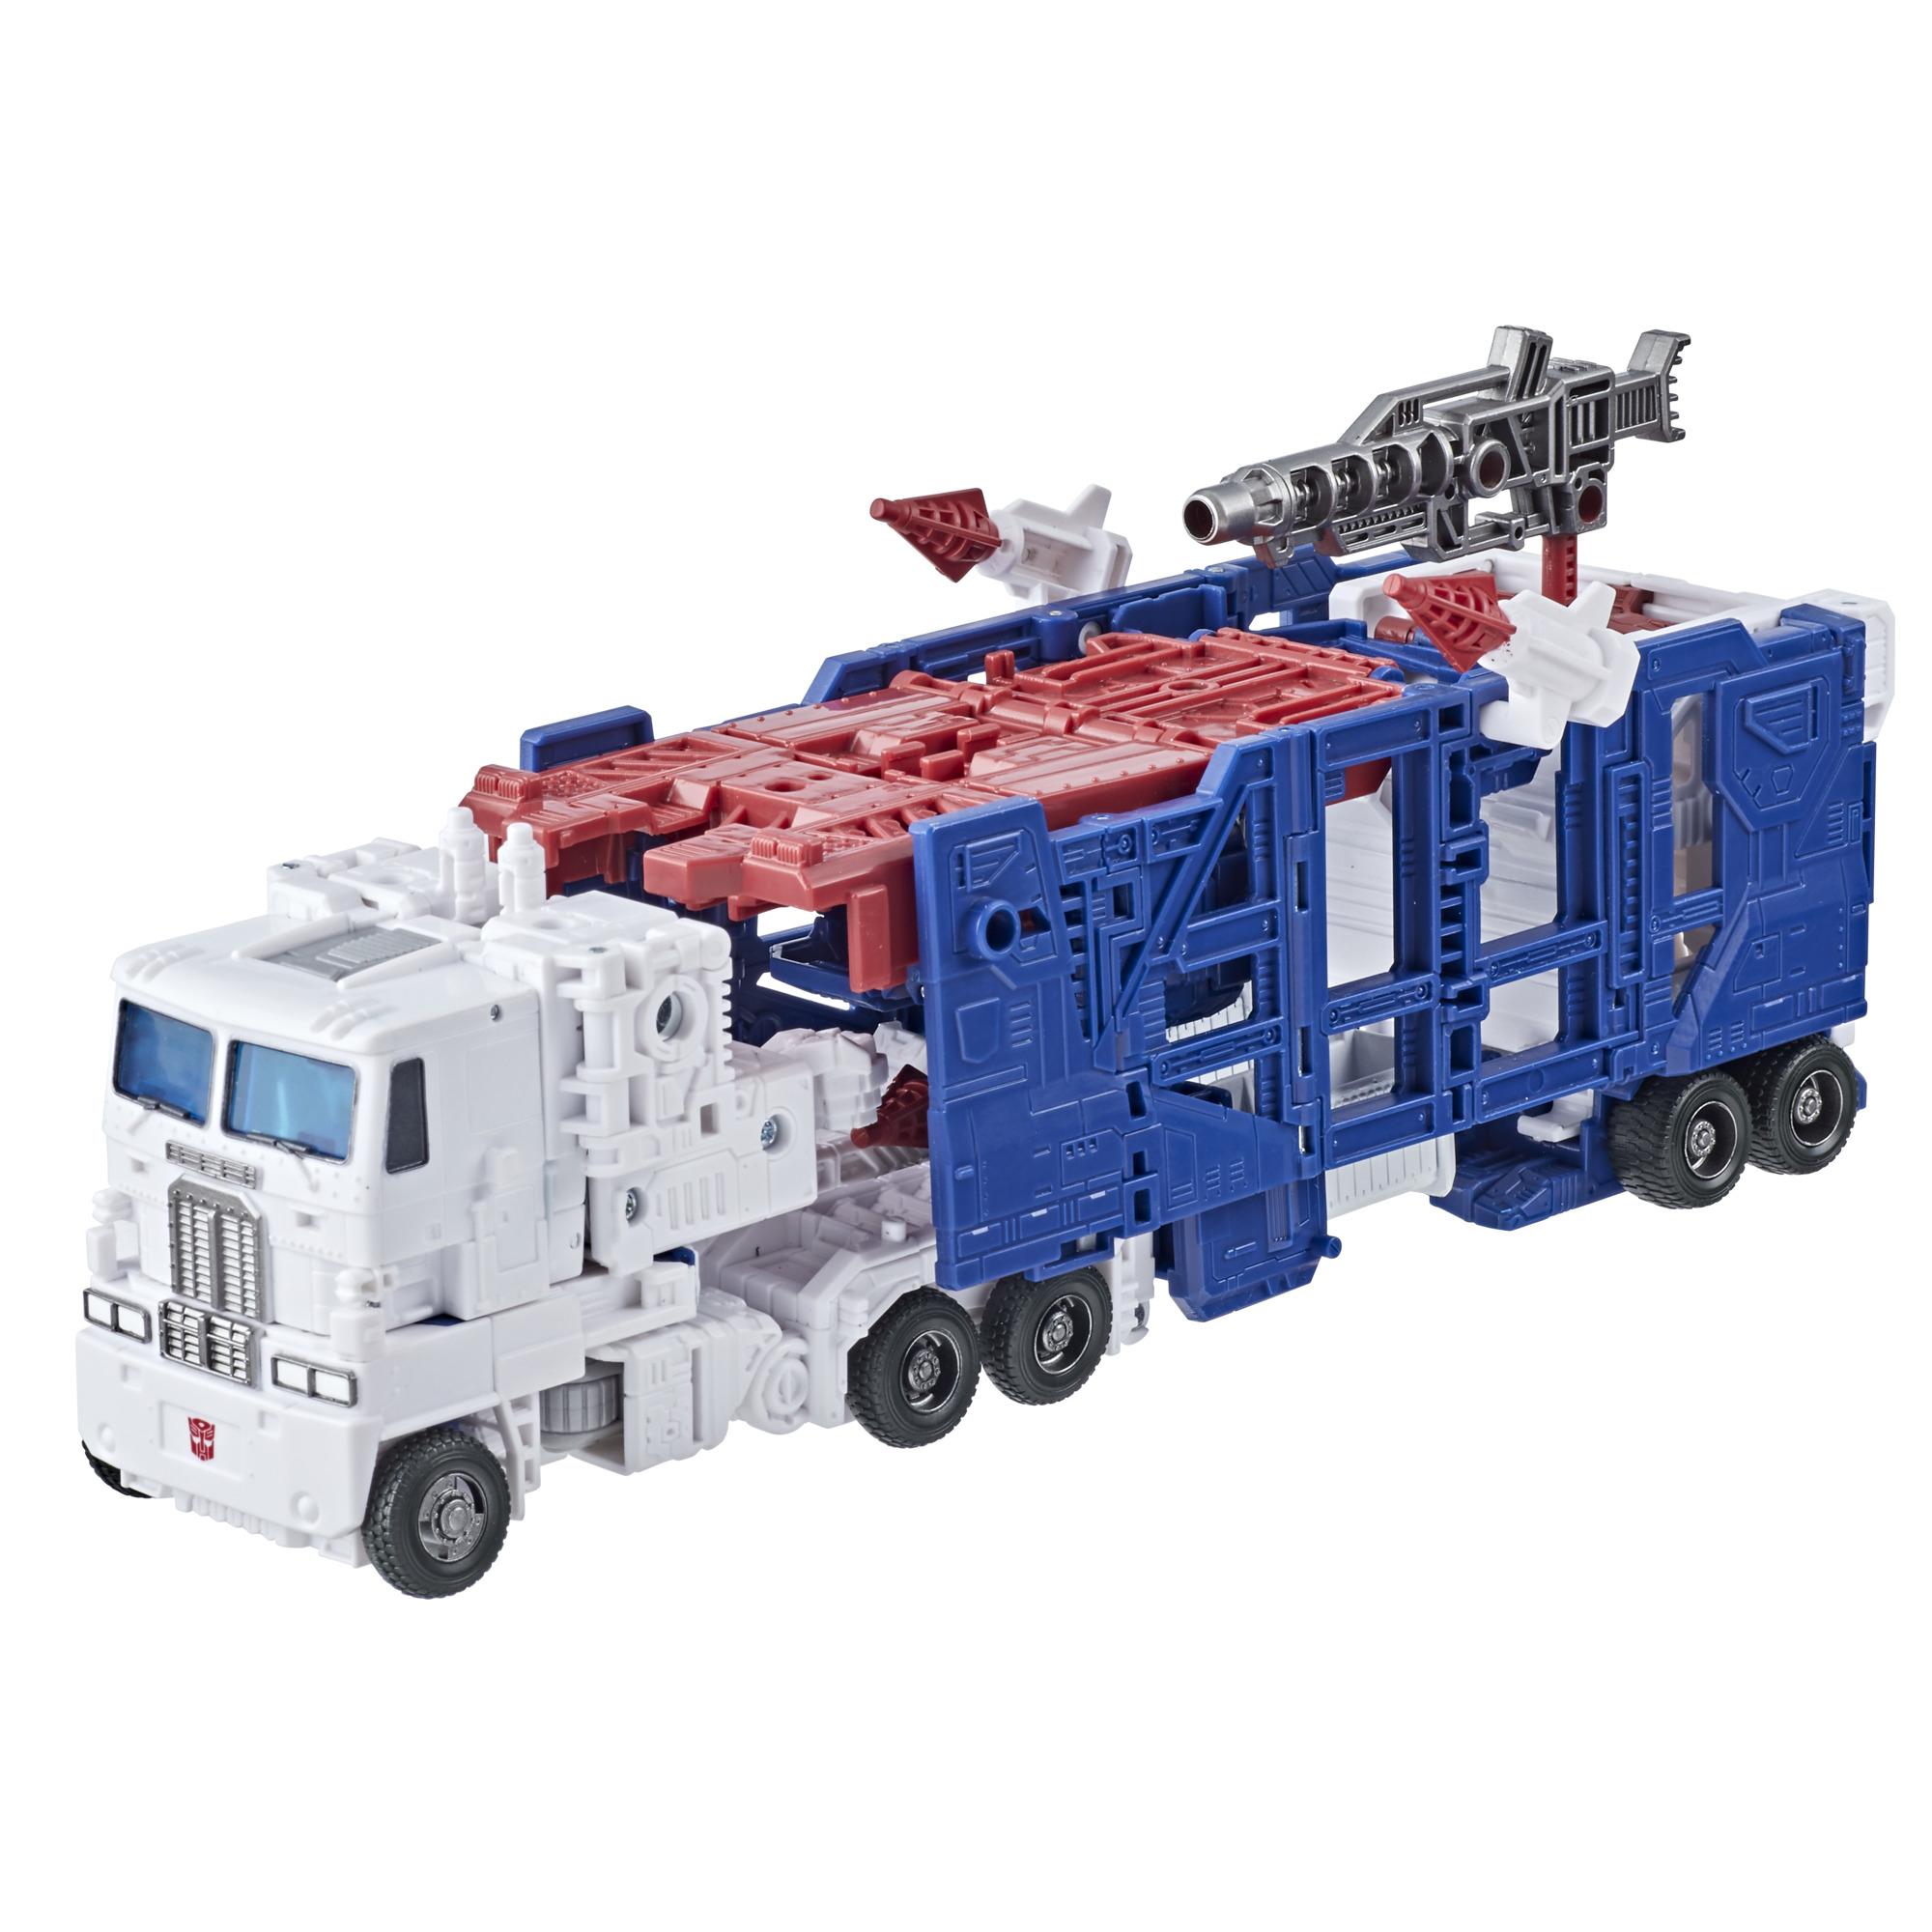 Transformers Generations War for Cybertron: Kingdom - Leader Ultra Magnus